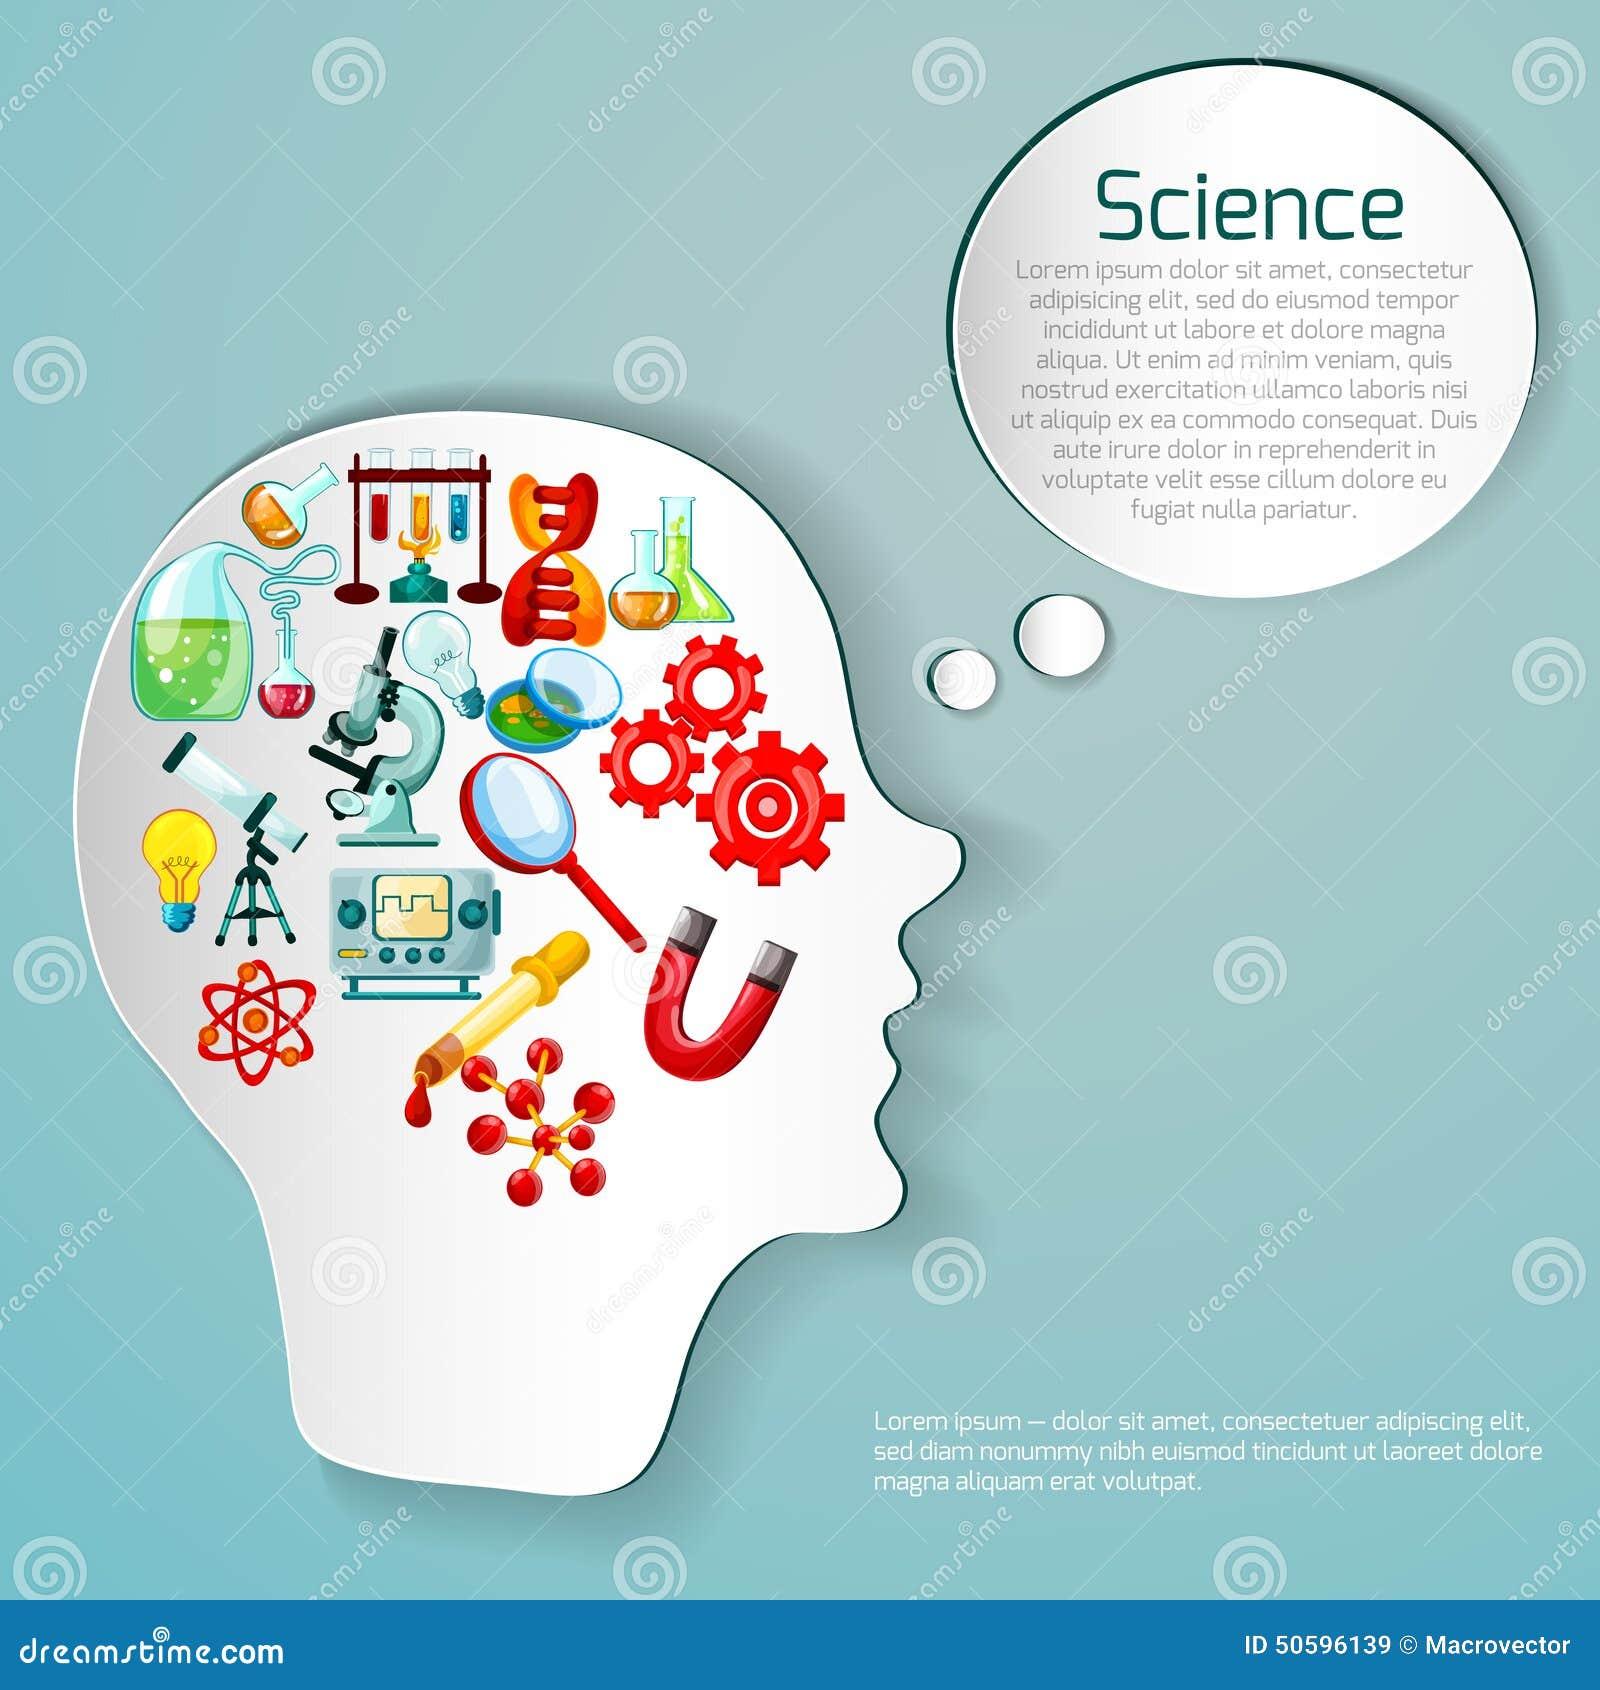 Science Poster Illustration Stock Vector